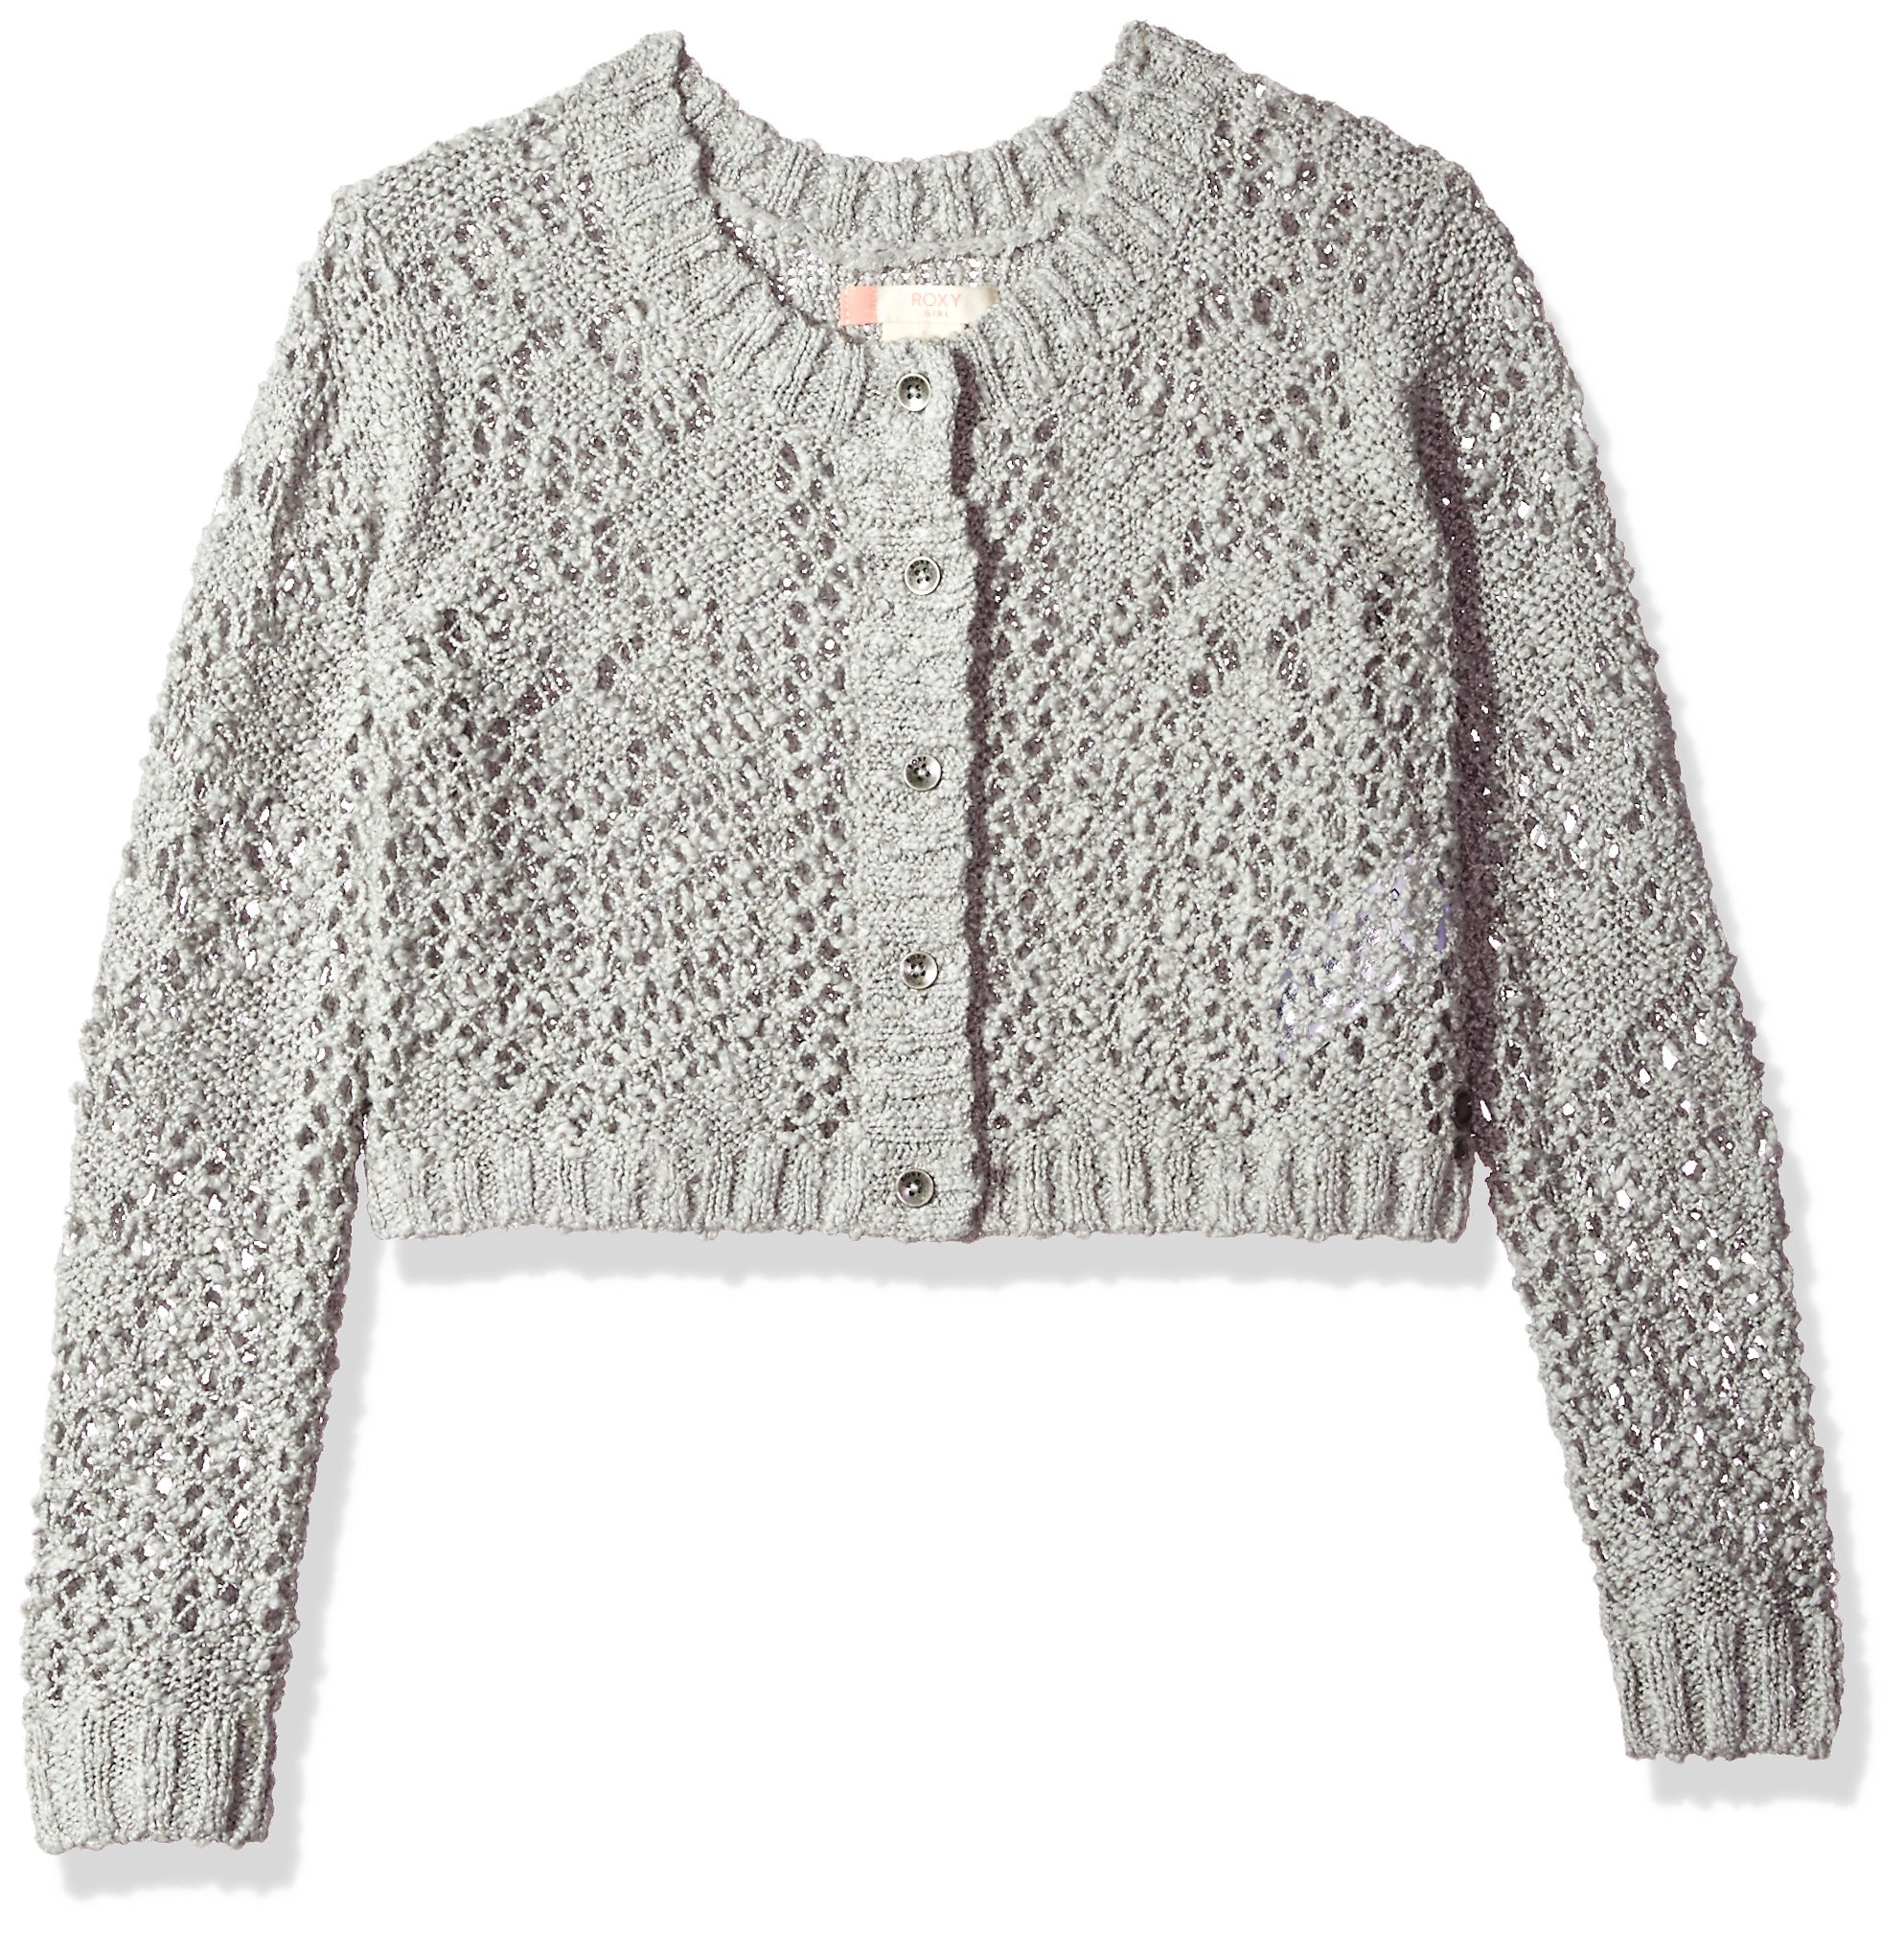 Roxy Big Girls' High Friendship Sweater, Heritage Heather, 10/M